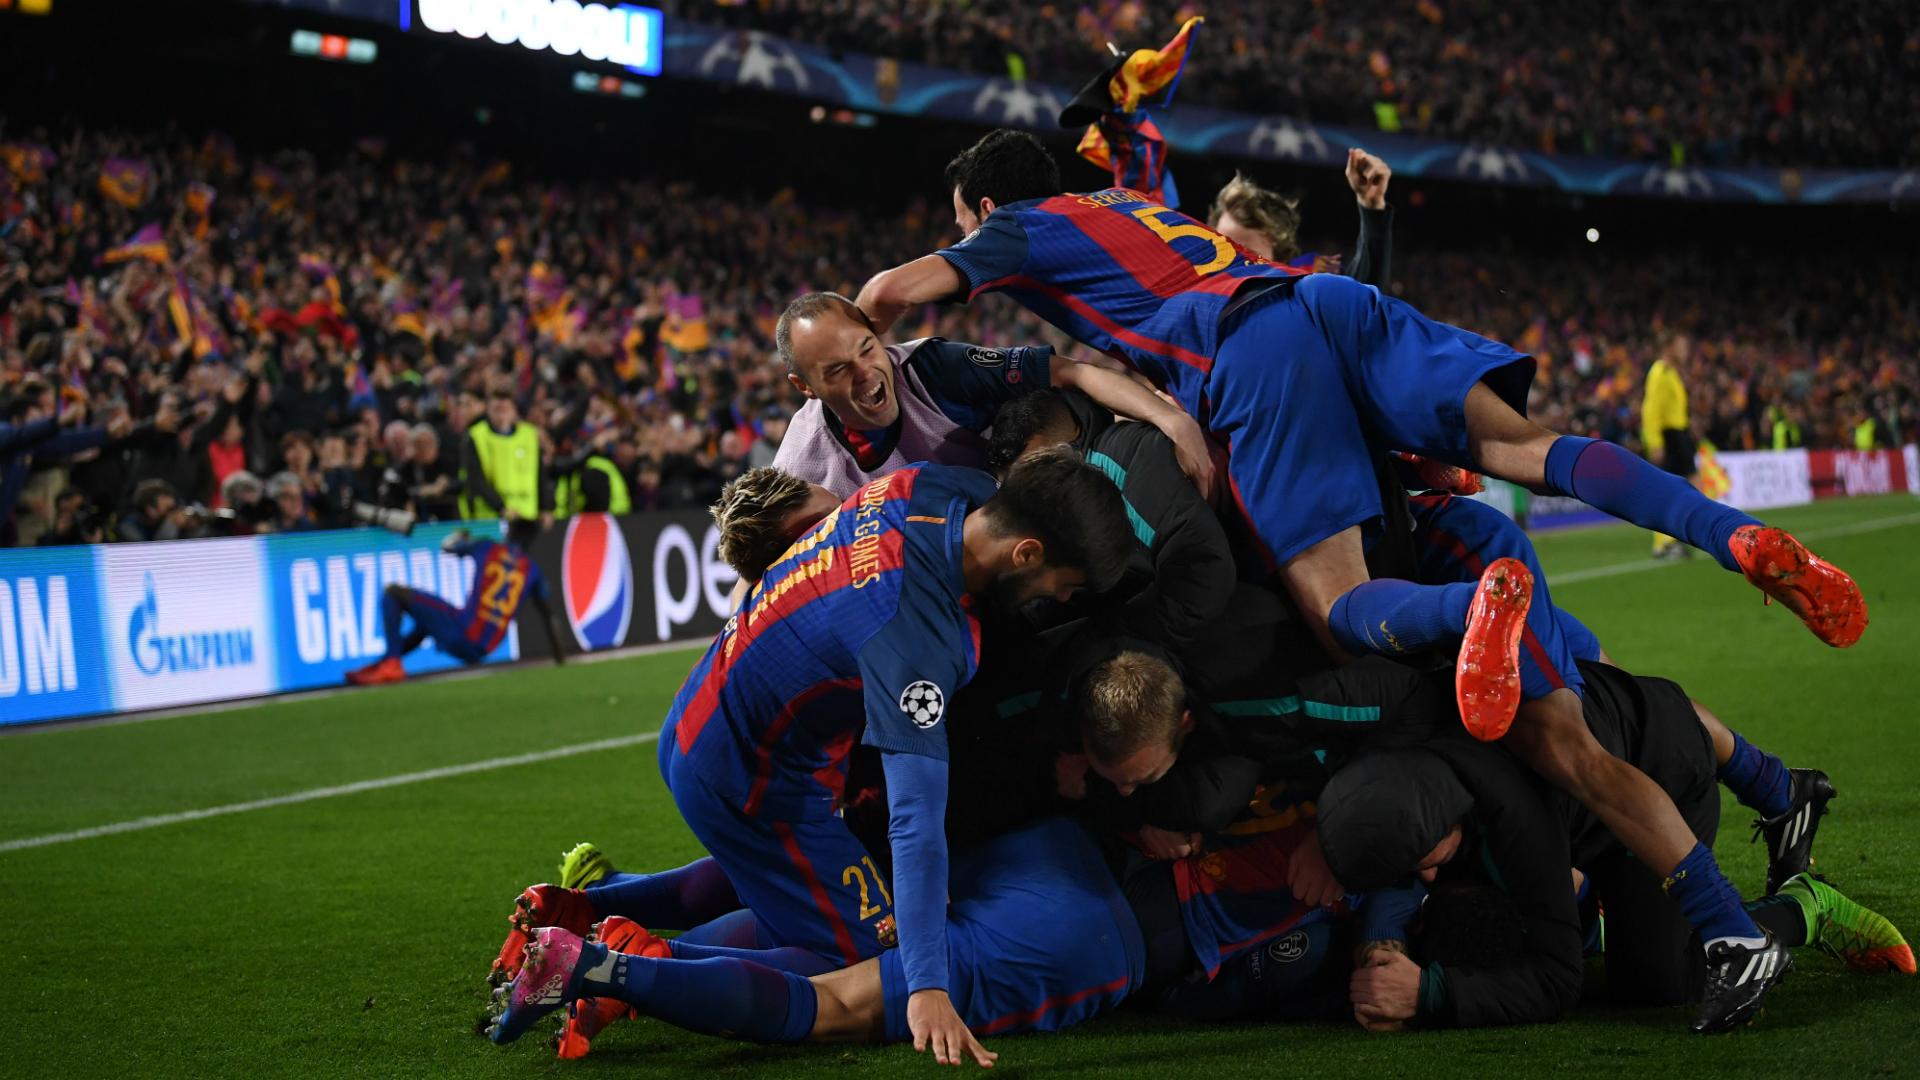 Barcelona fined for celebratory PSG pitch invasion